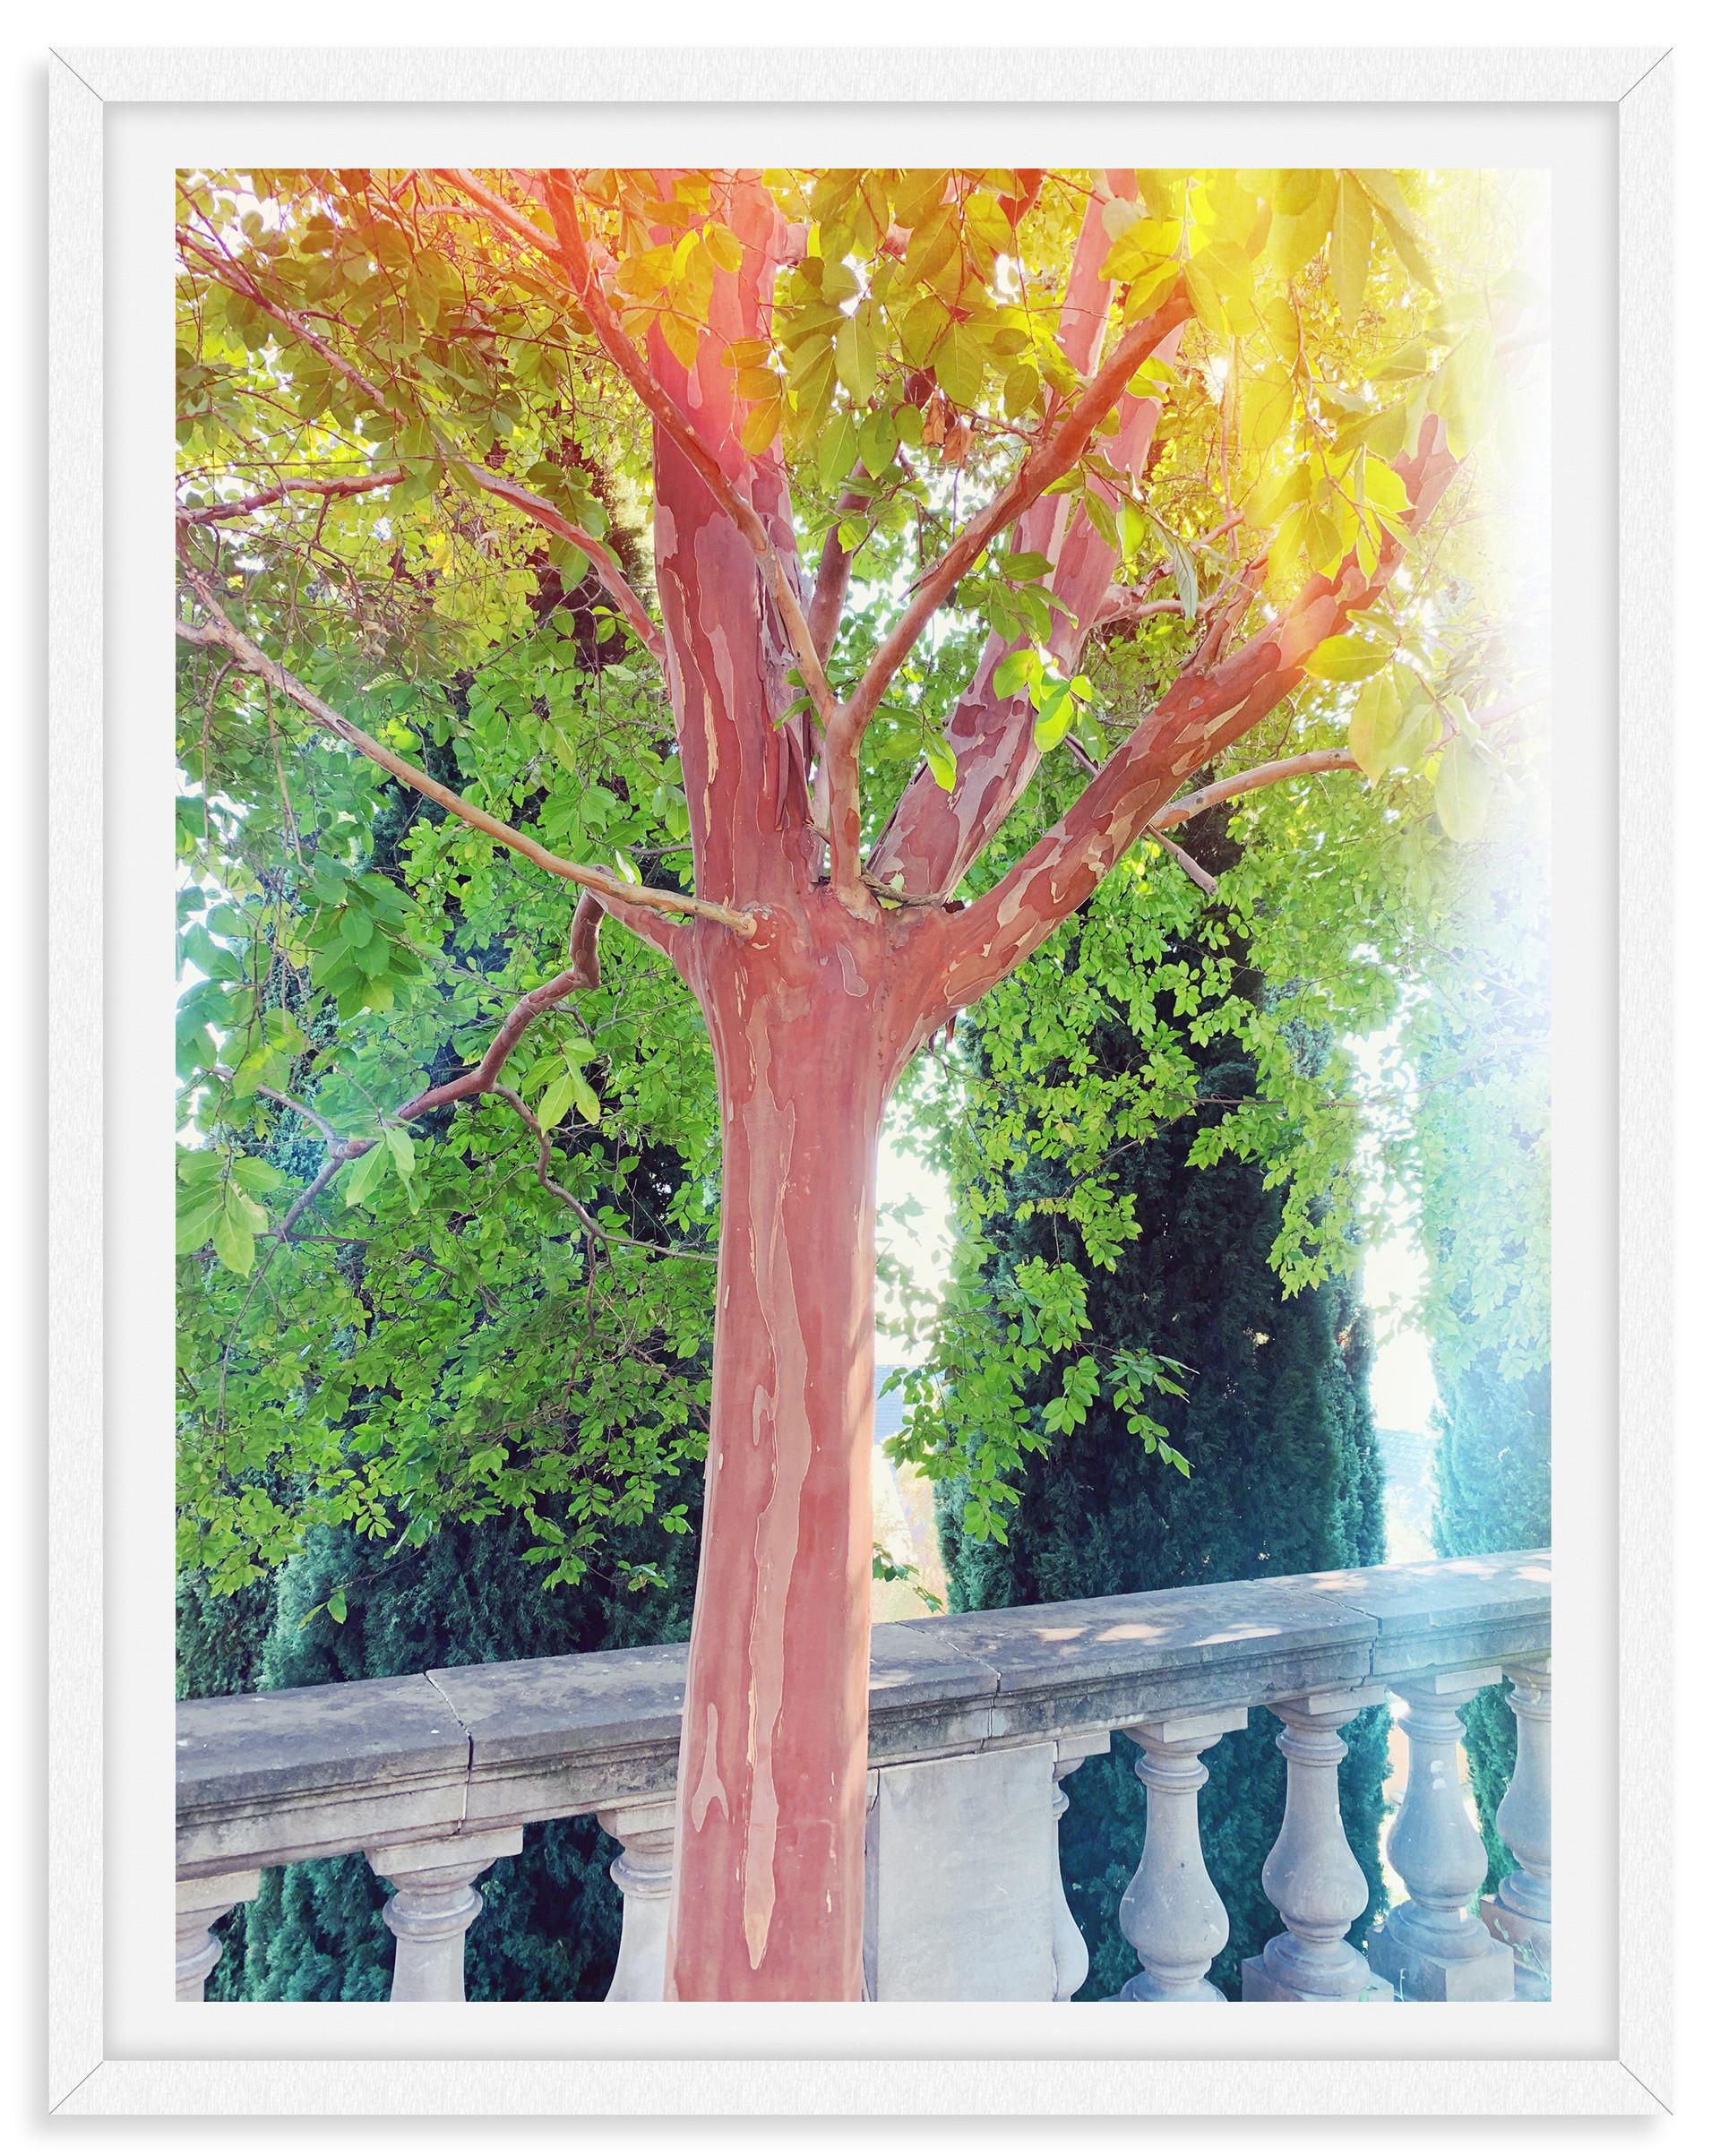 trees fall leaves sunlight garden wall a